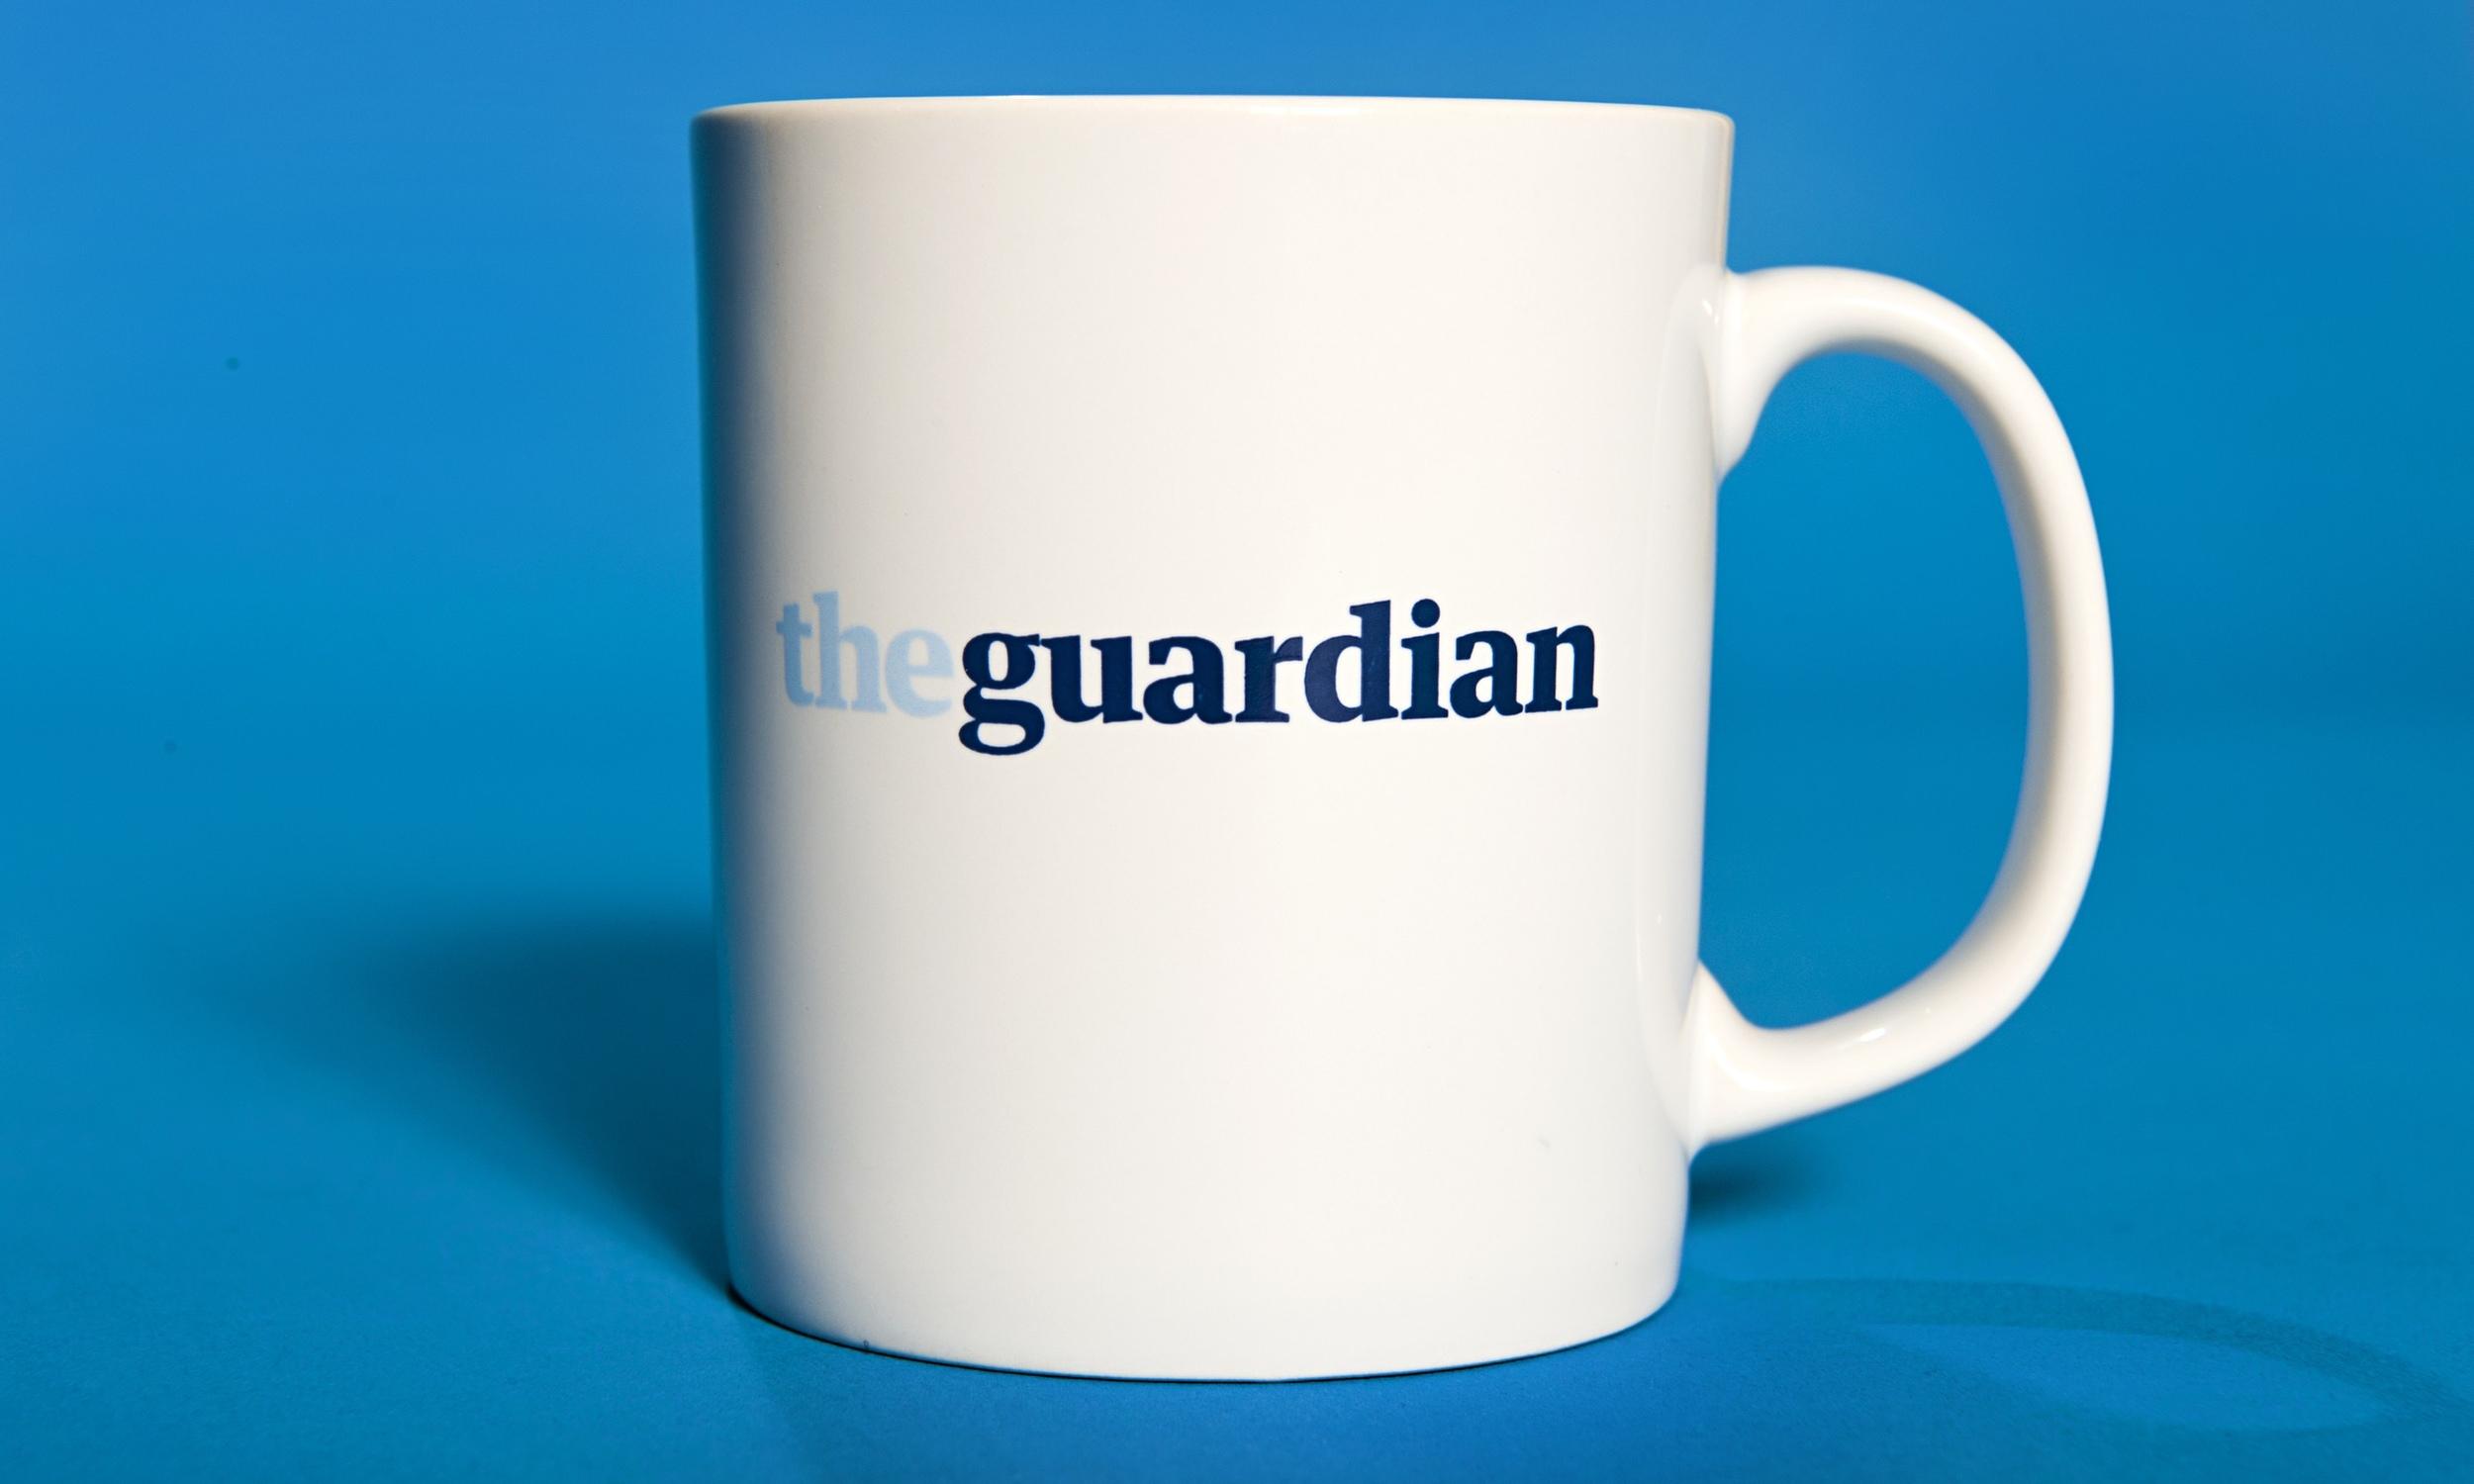 The illustrious Not the Booker prize mug (via The Guardian )